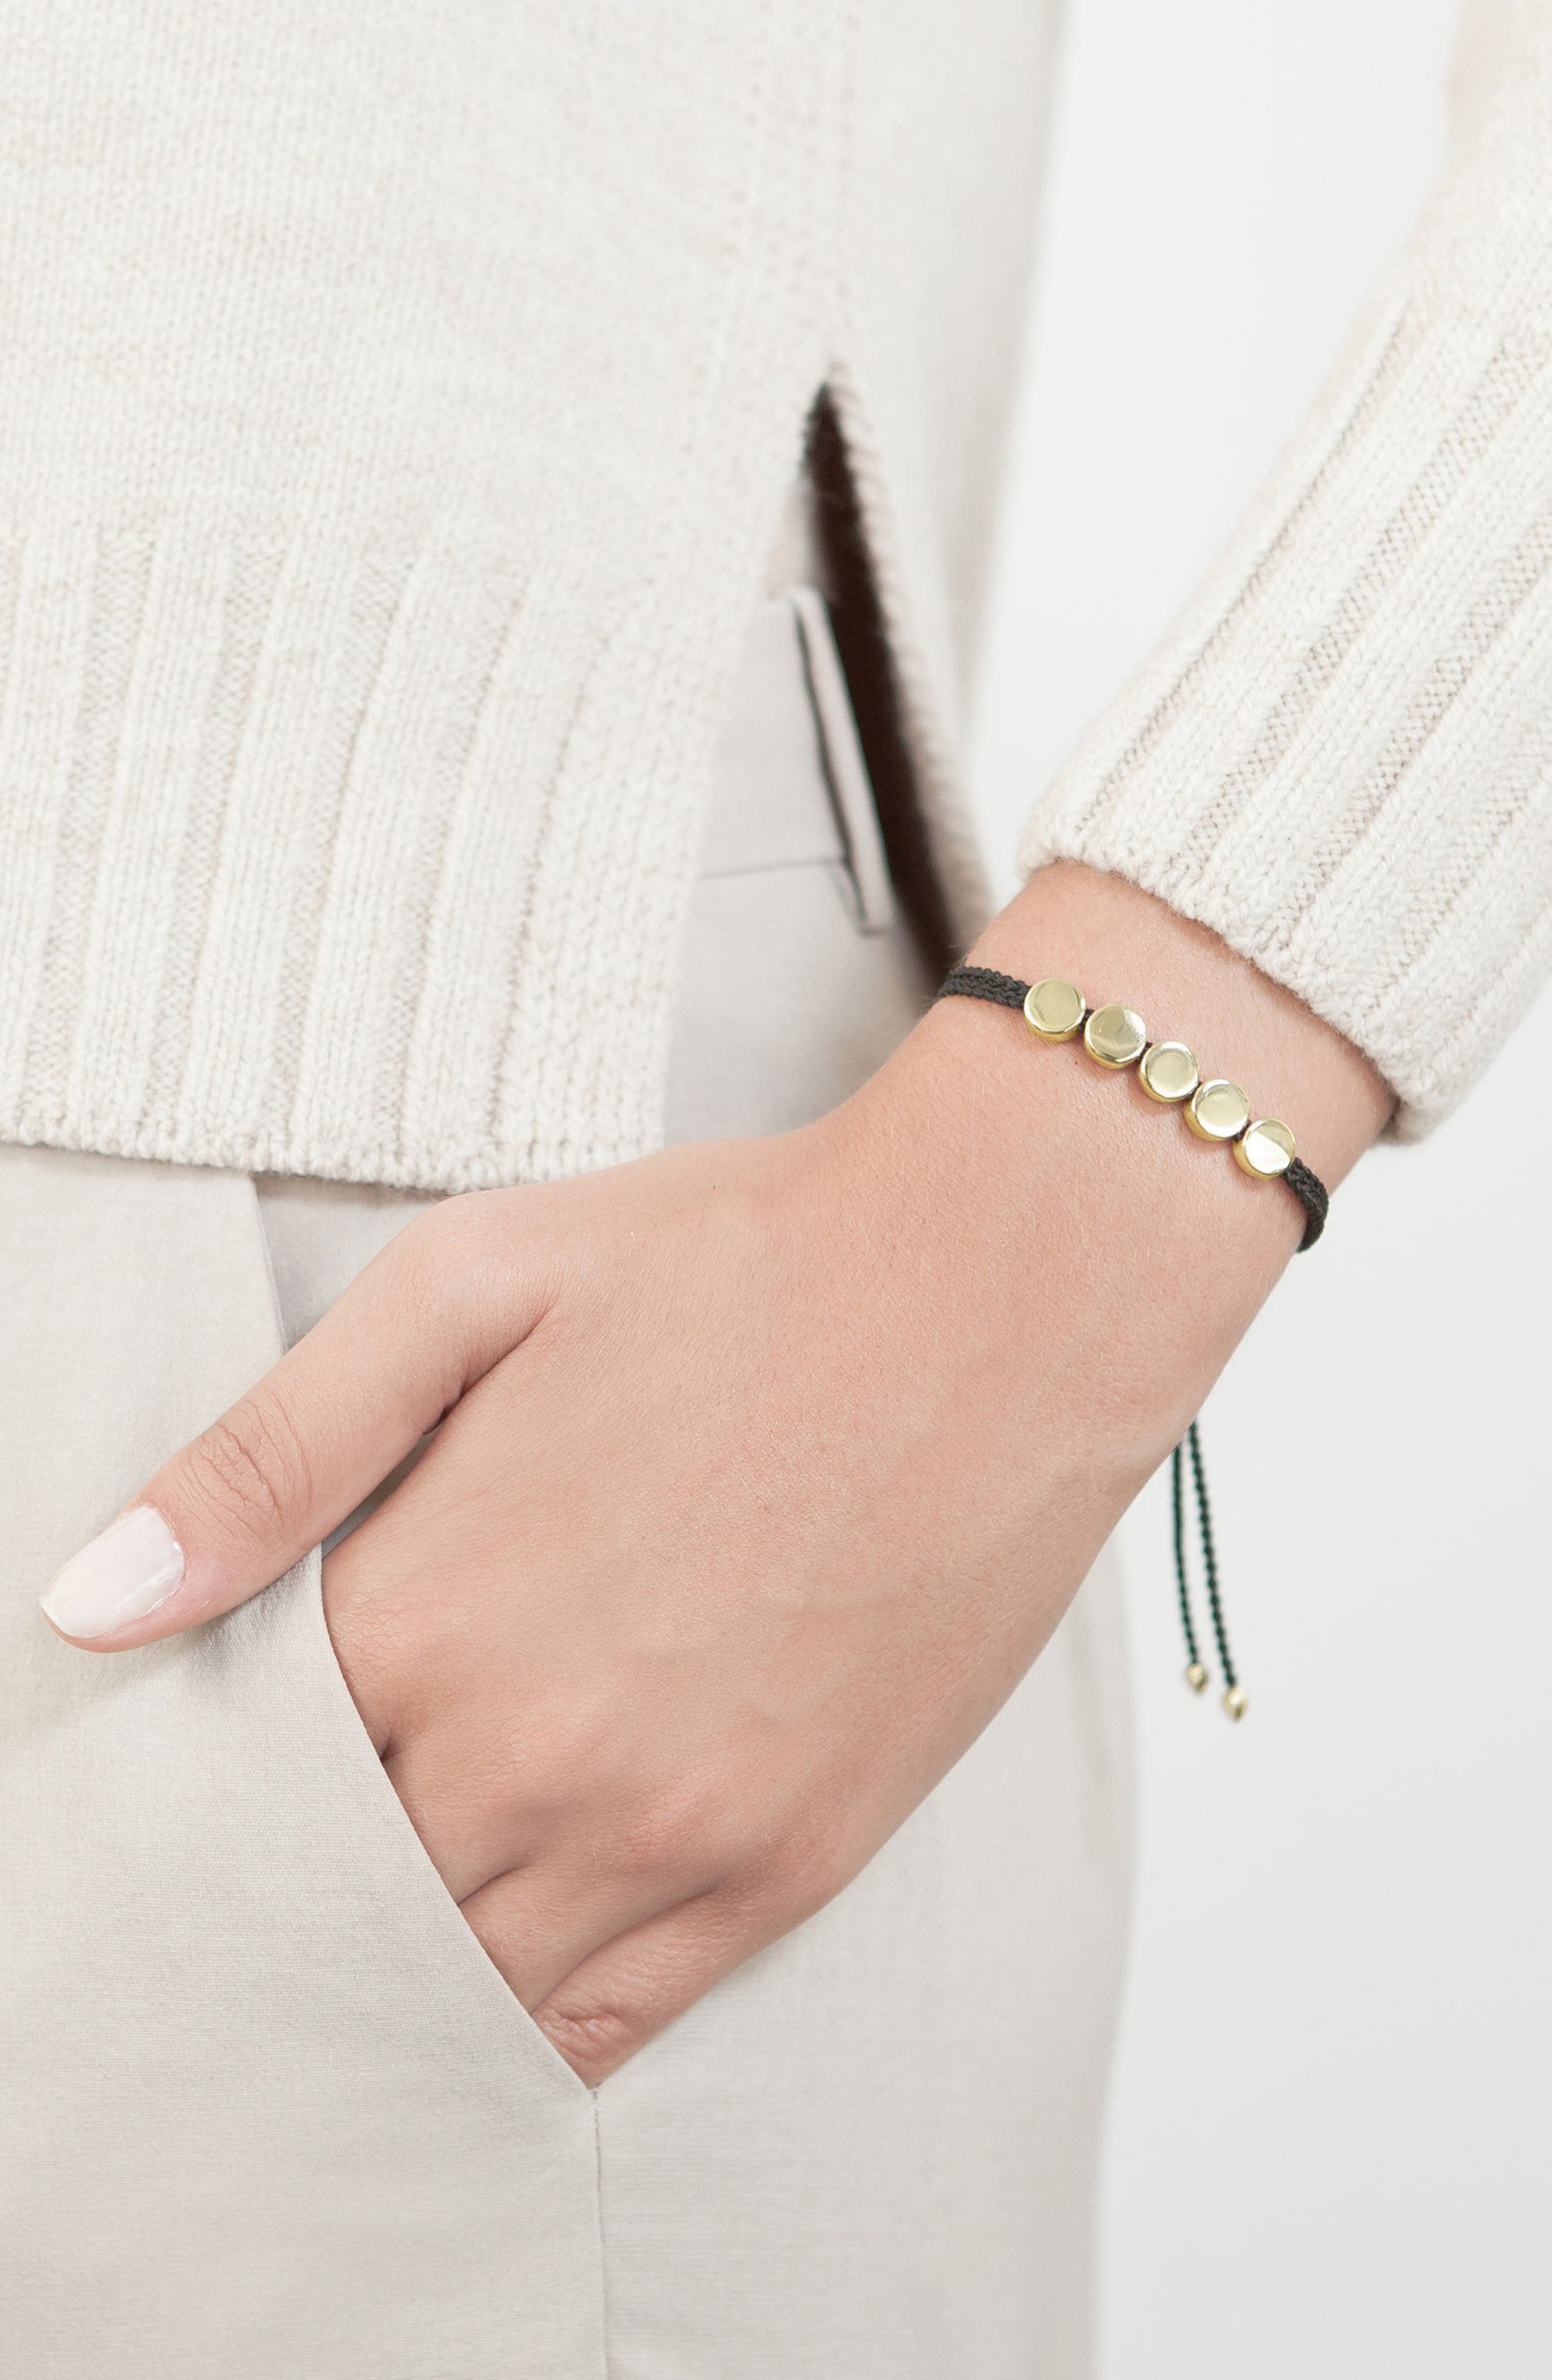 MONICA VINADER, Engravable Linear Bead Friendship Bracelet, Alternate thumbnail 2, color, BLACK/ YELLOW GOLD